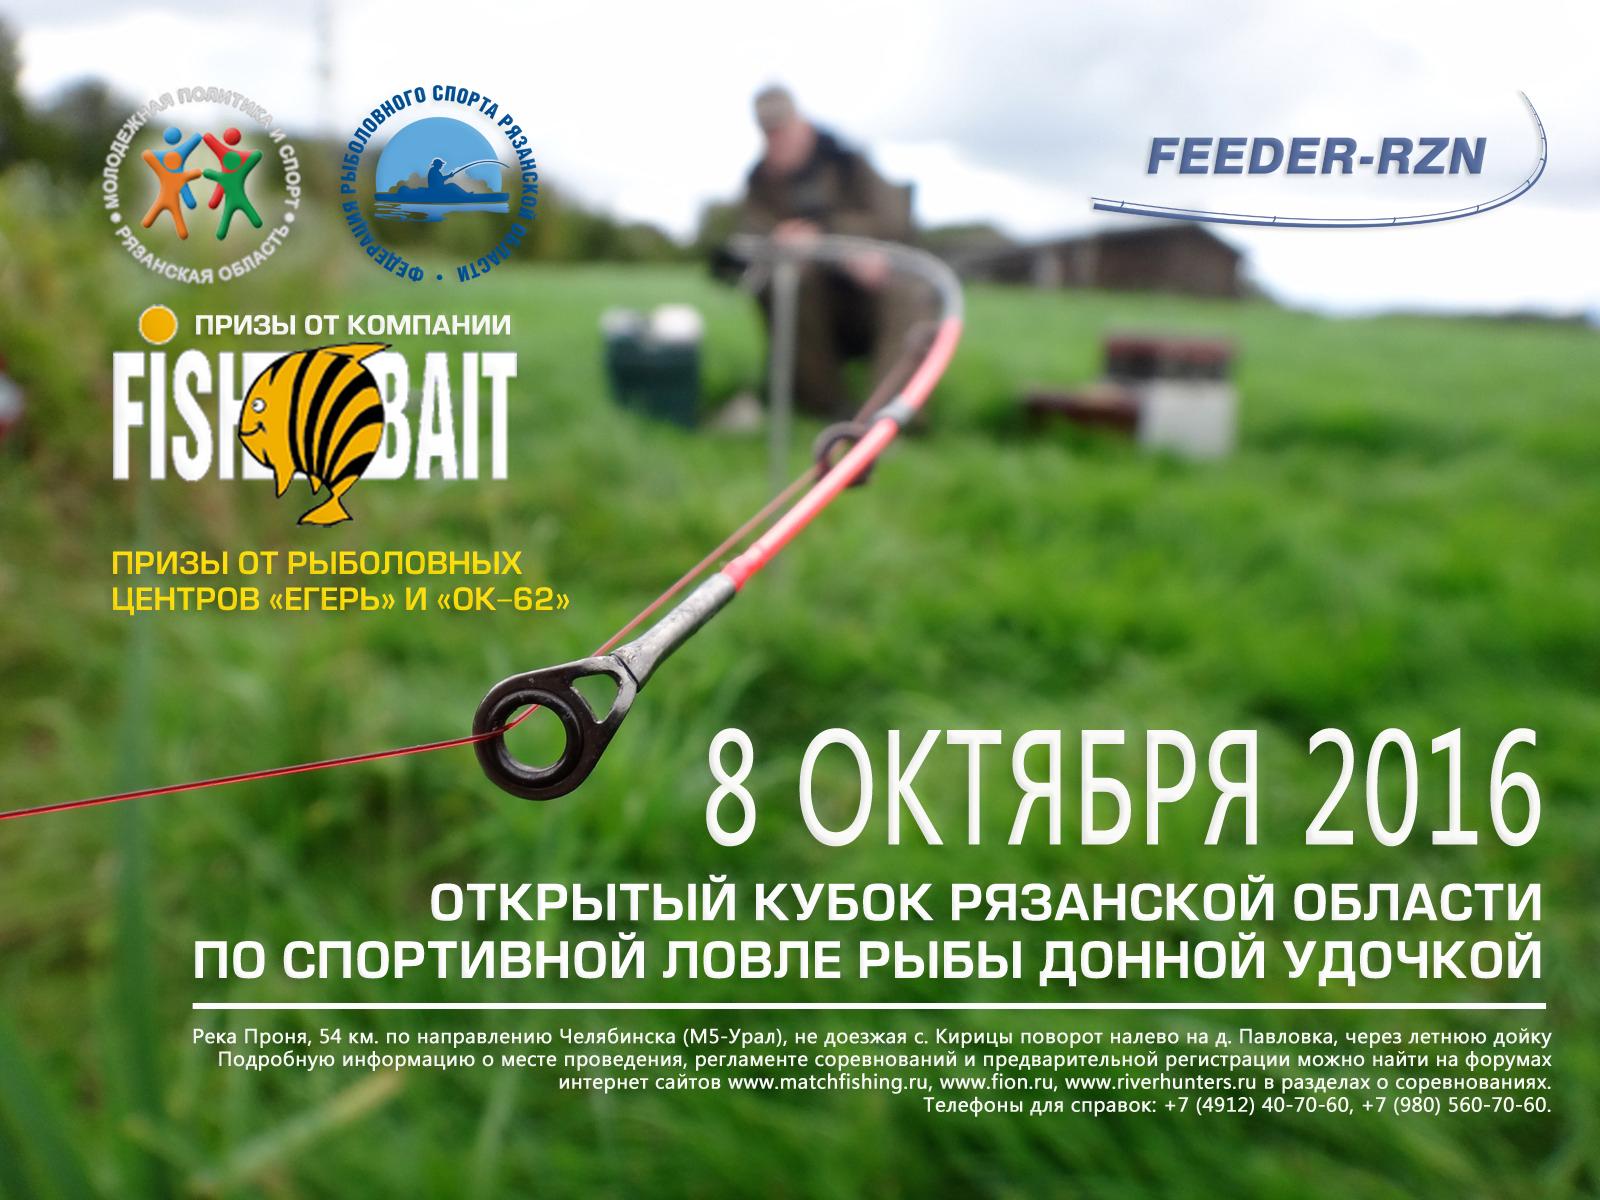 рыбалка в ряз. области